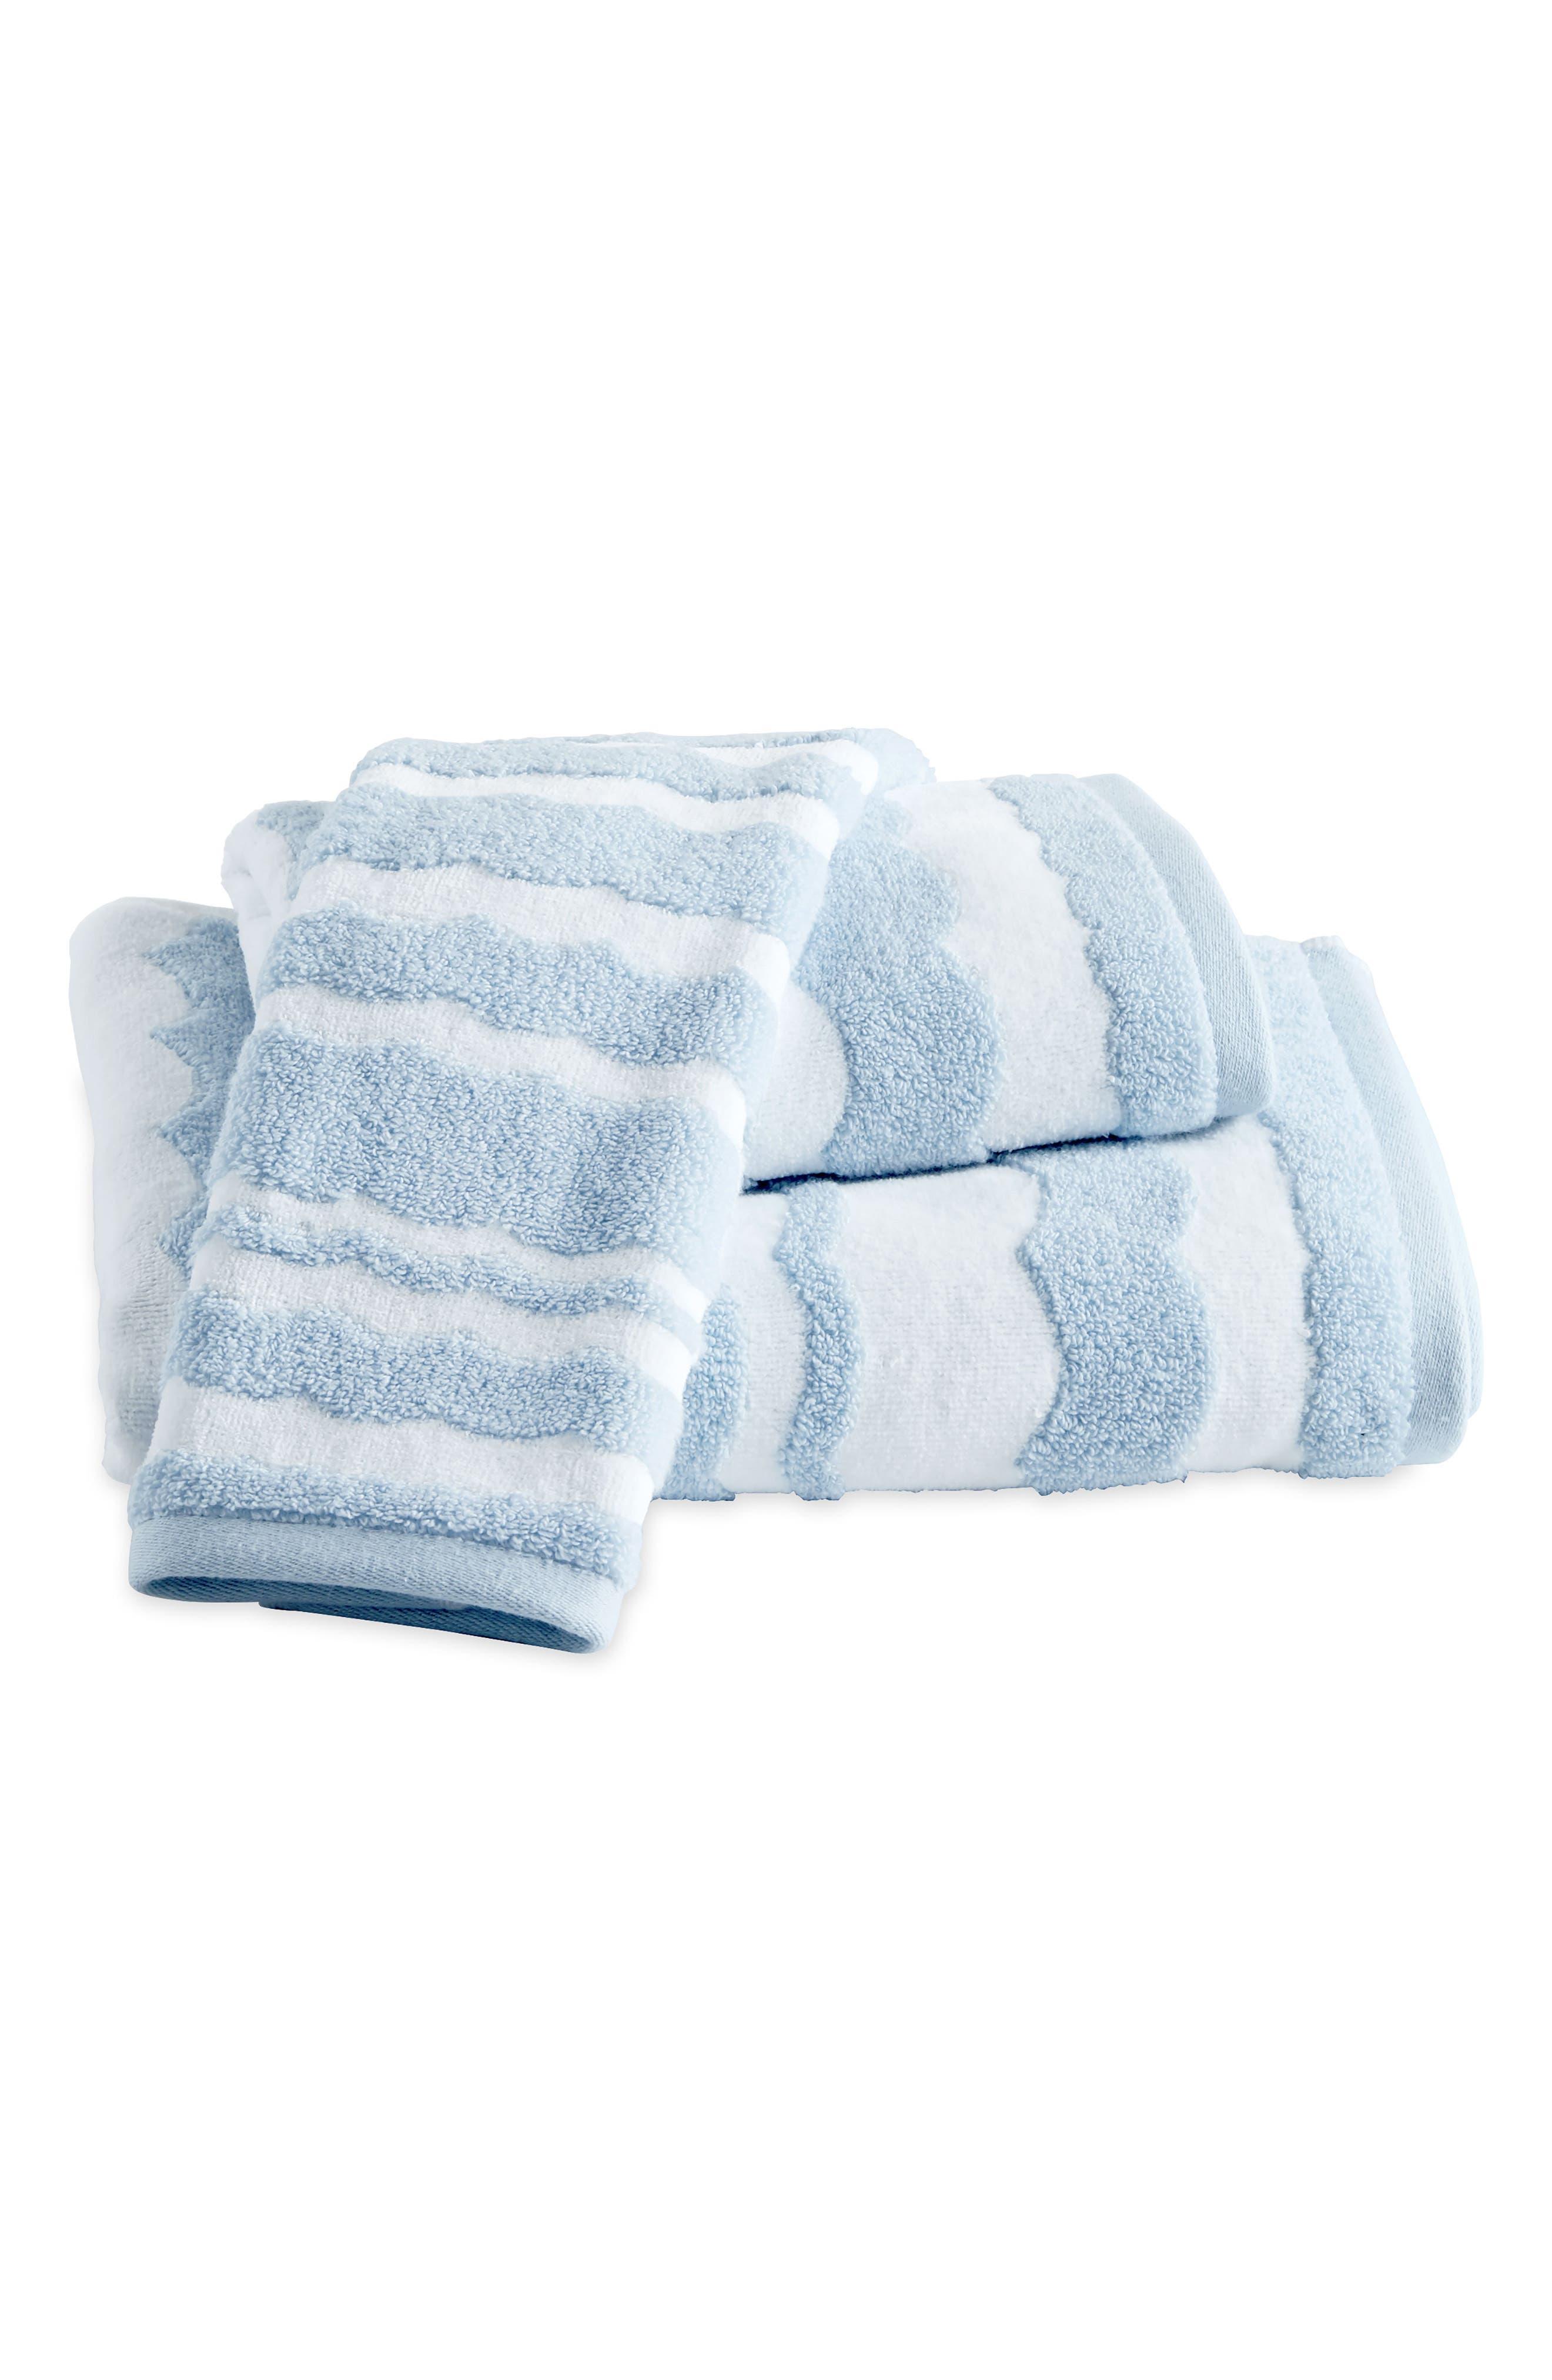 Main Image - Destinations Wave Scallop Bath Towel, Hand Towel and Tip Towel Set